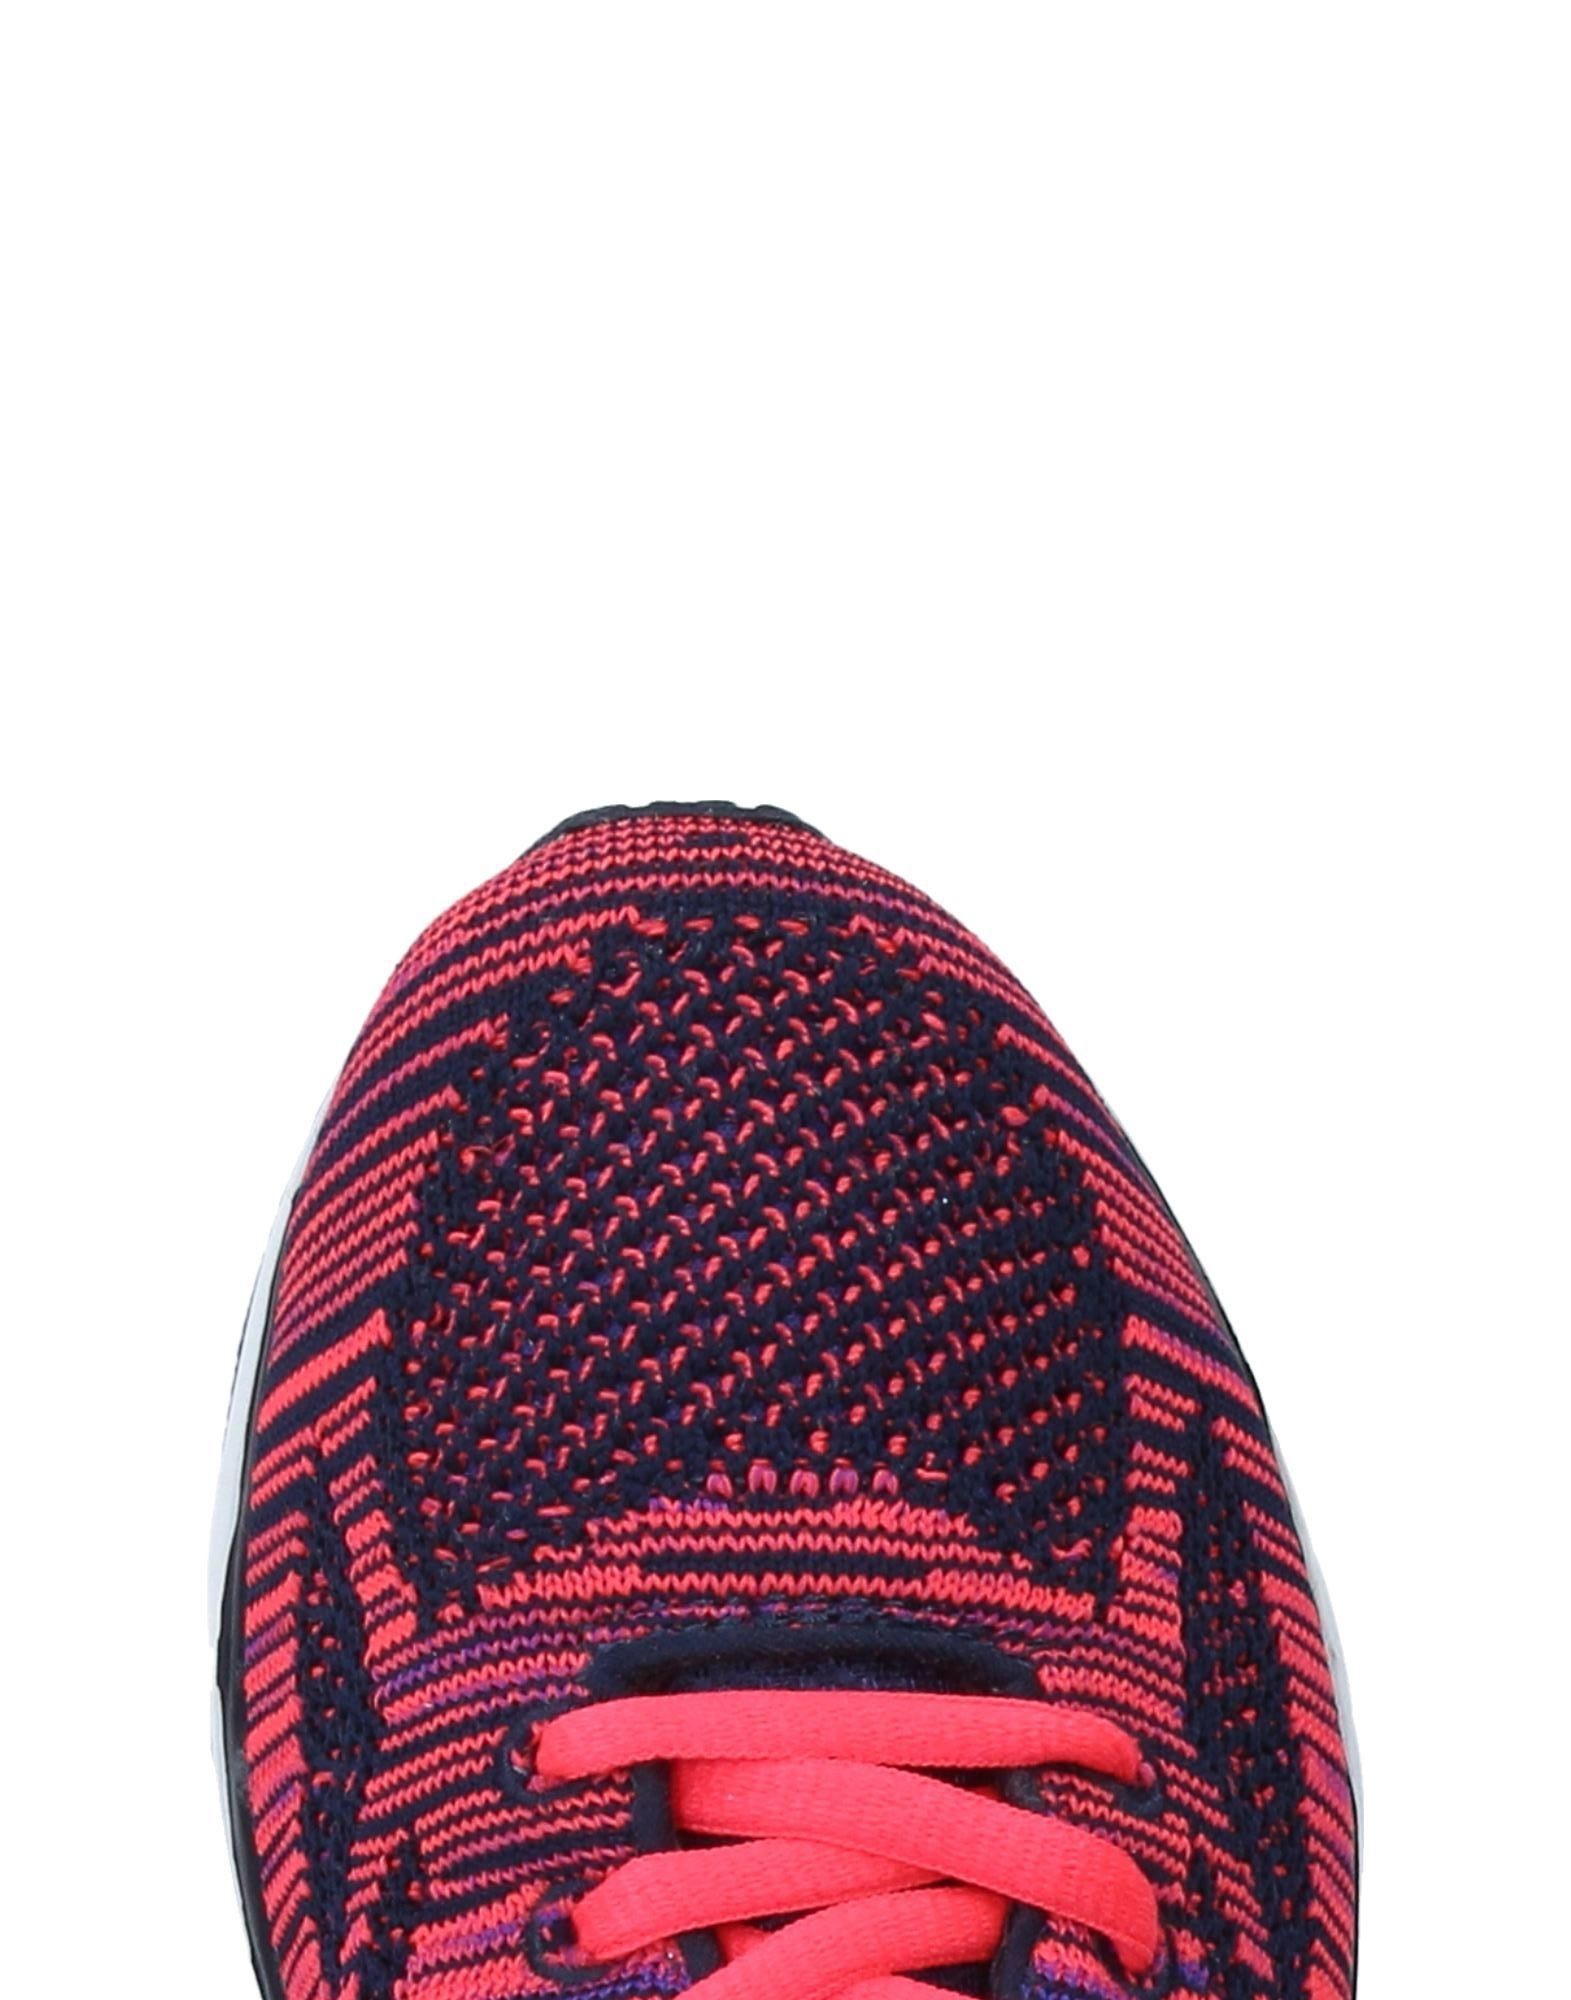 Skechers Sneakers Damen beliebte  11255686UK Gute Qualität beliebte Damen Schuhe 226590